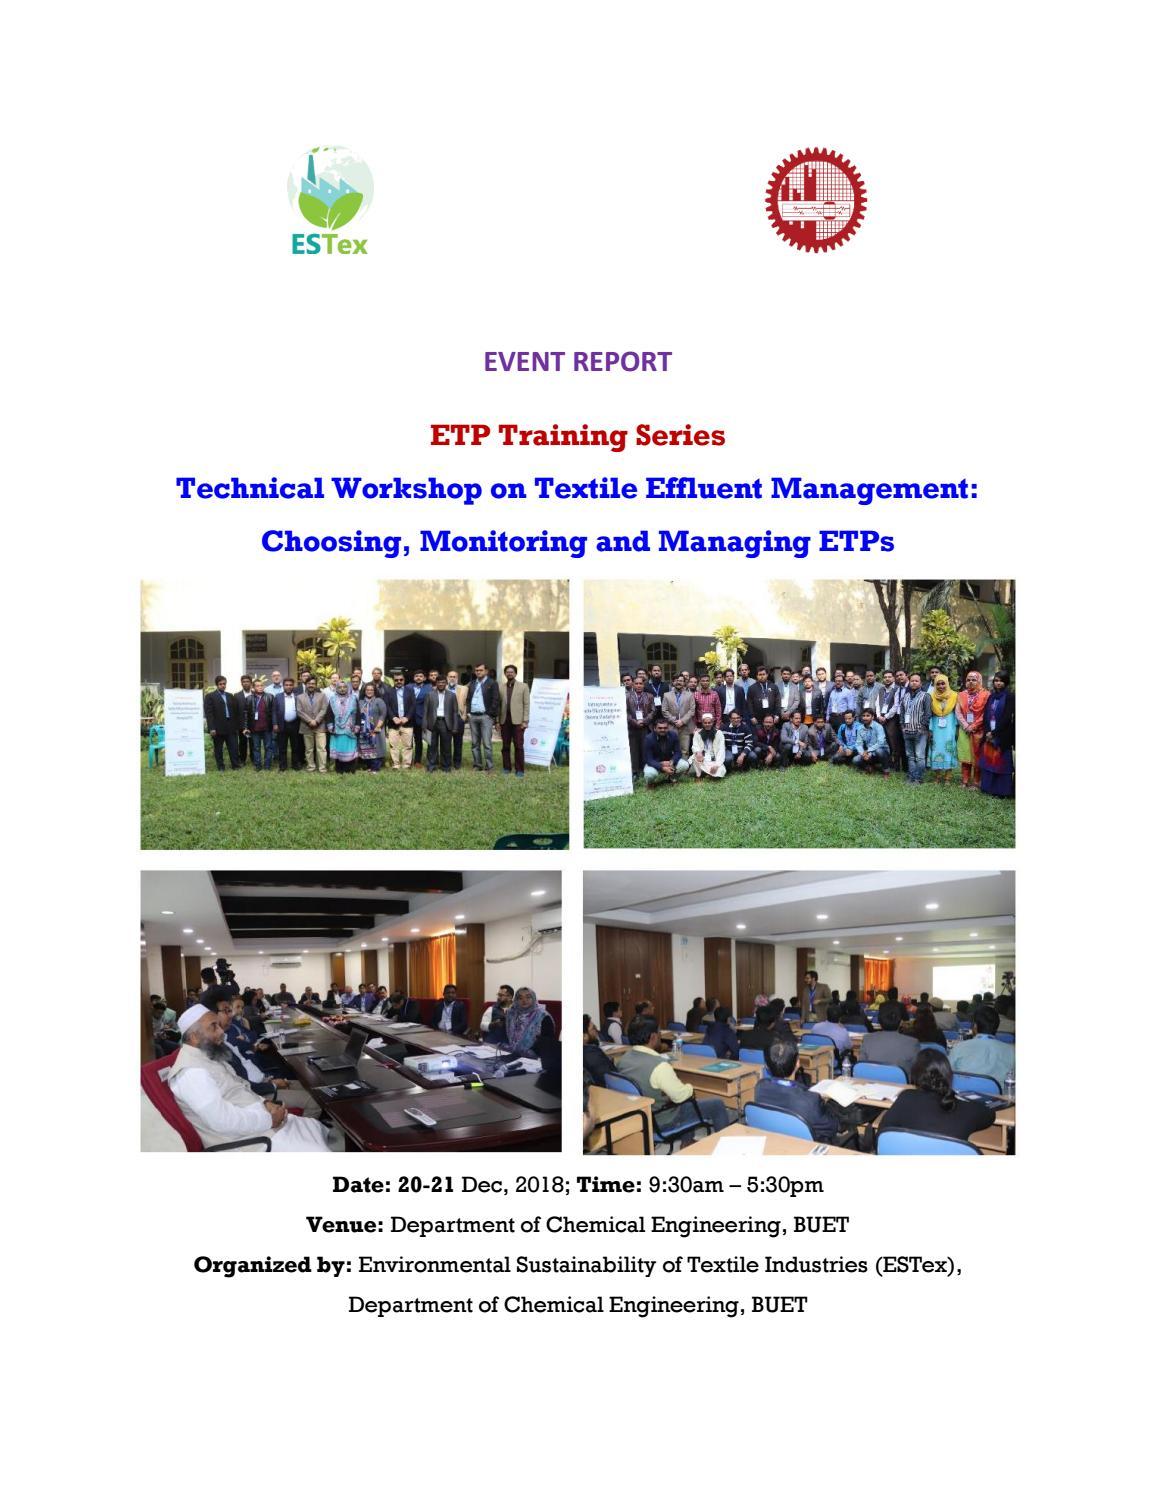 Technical Workshop on Textile Effluent Management: Choosing